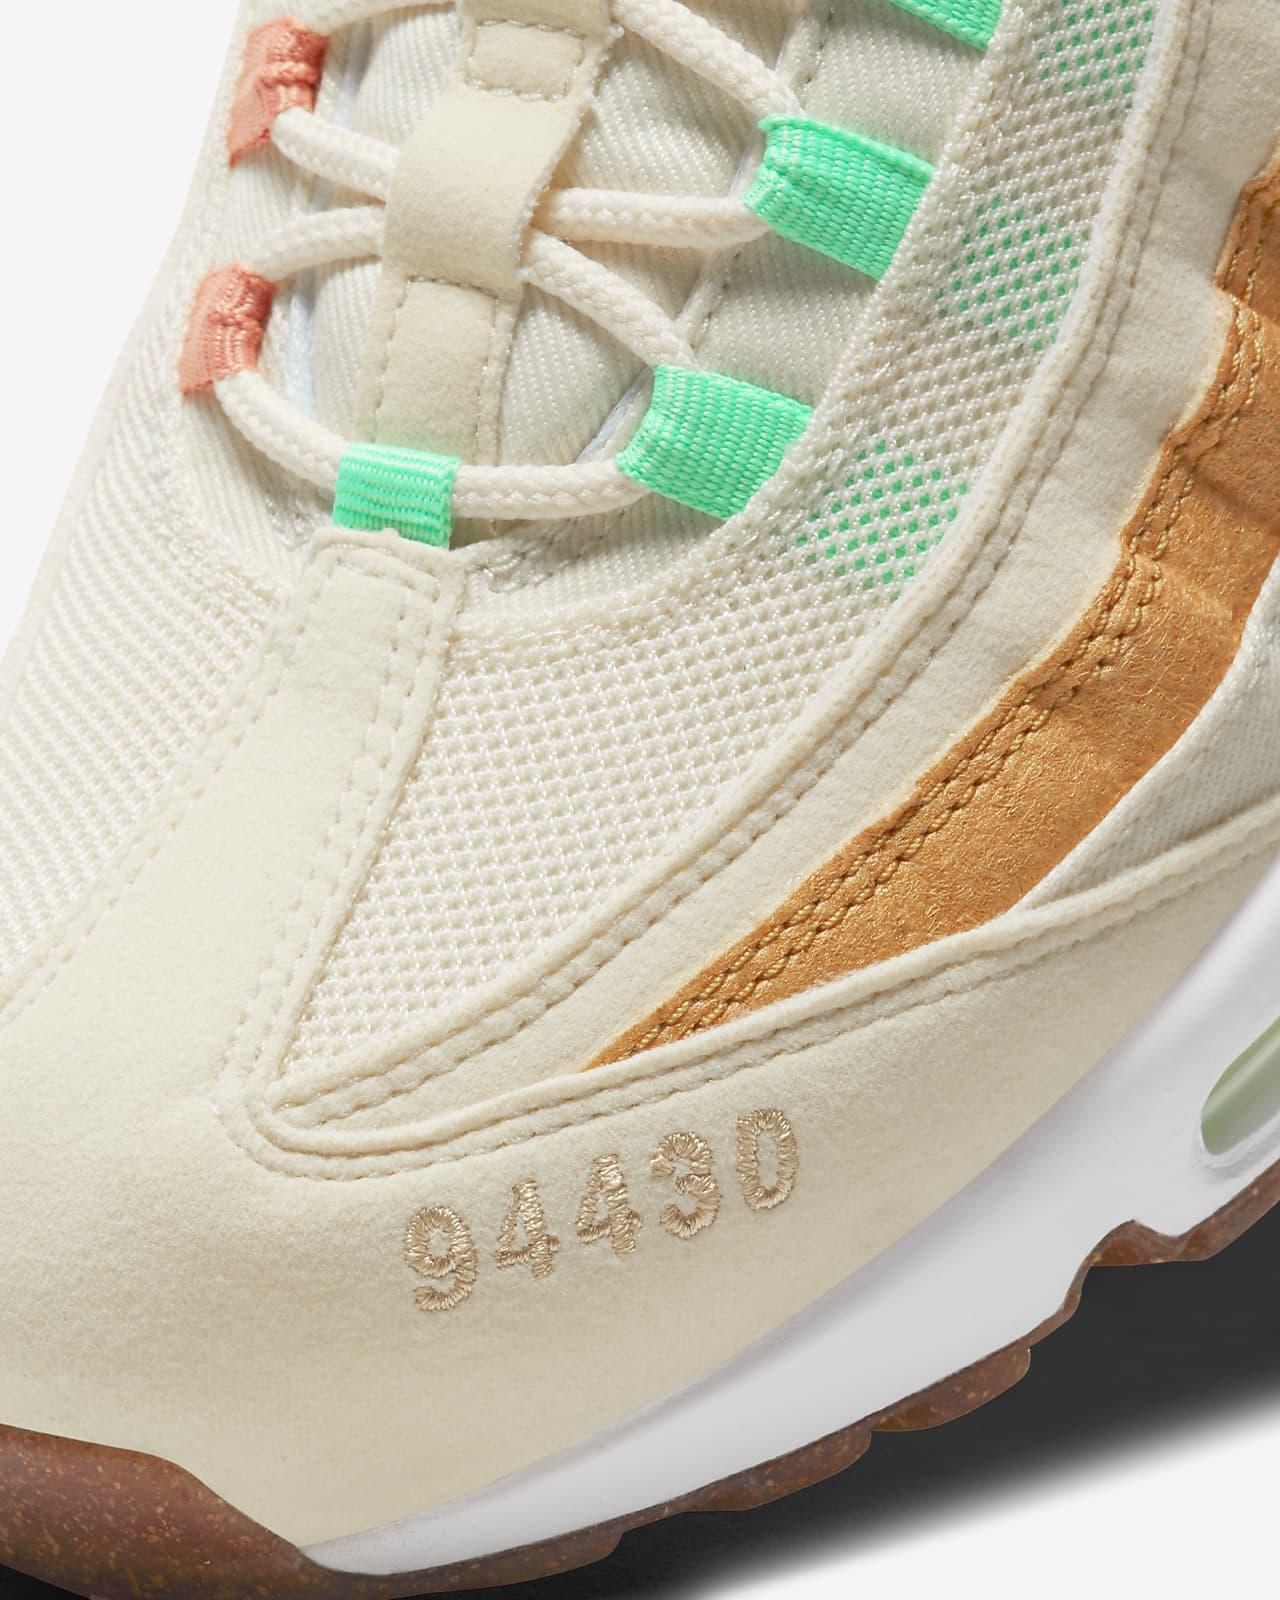 Nike Air Max 95 NRG Men's Shoe